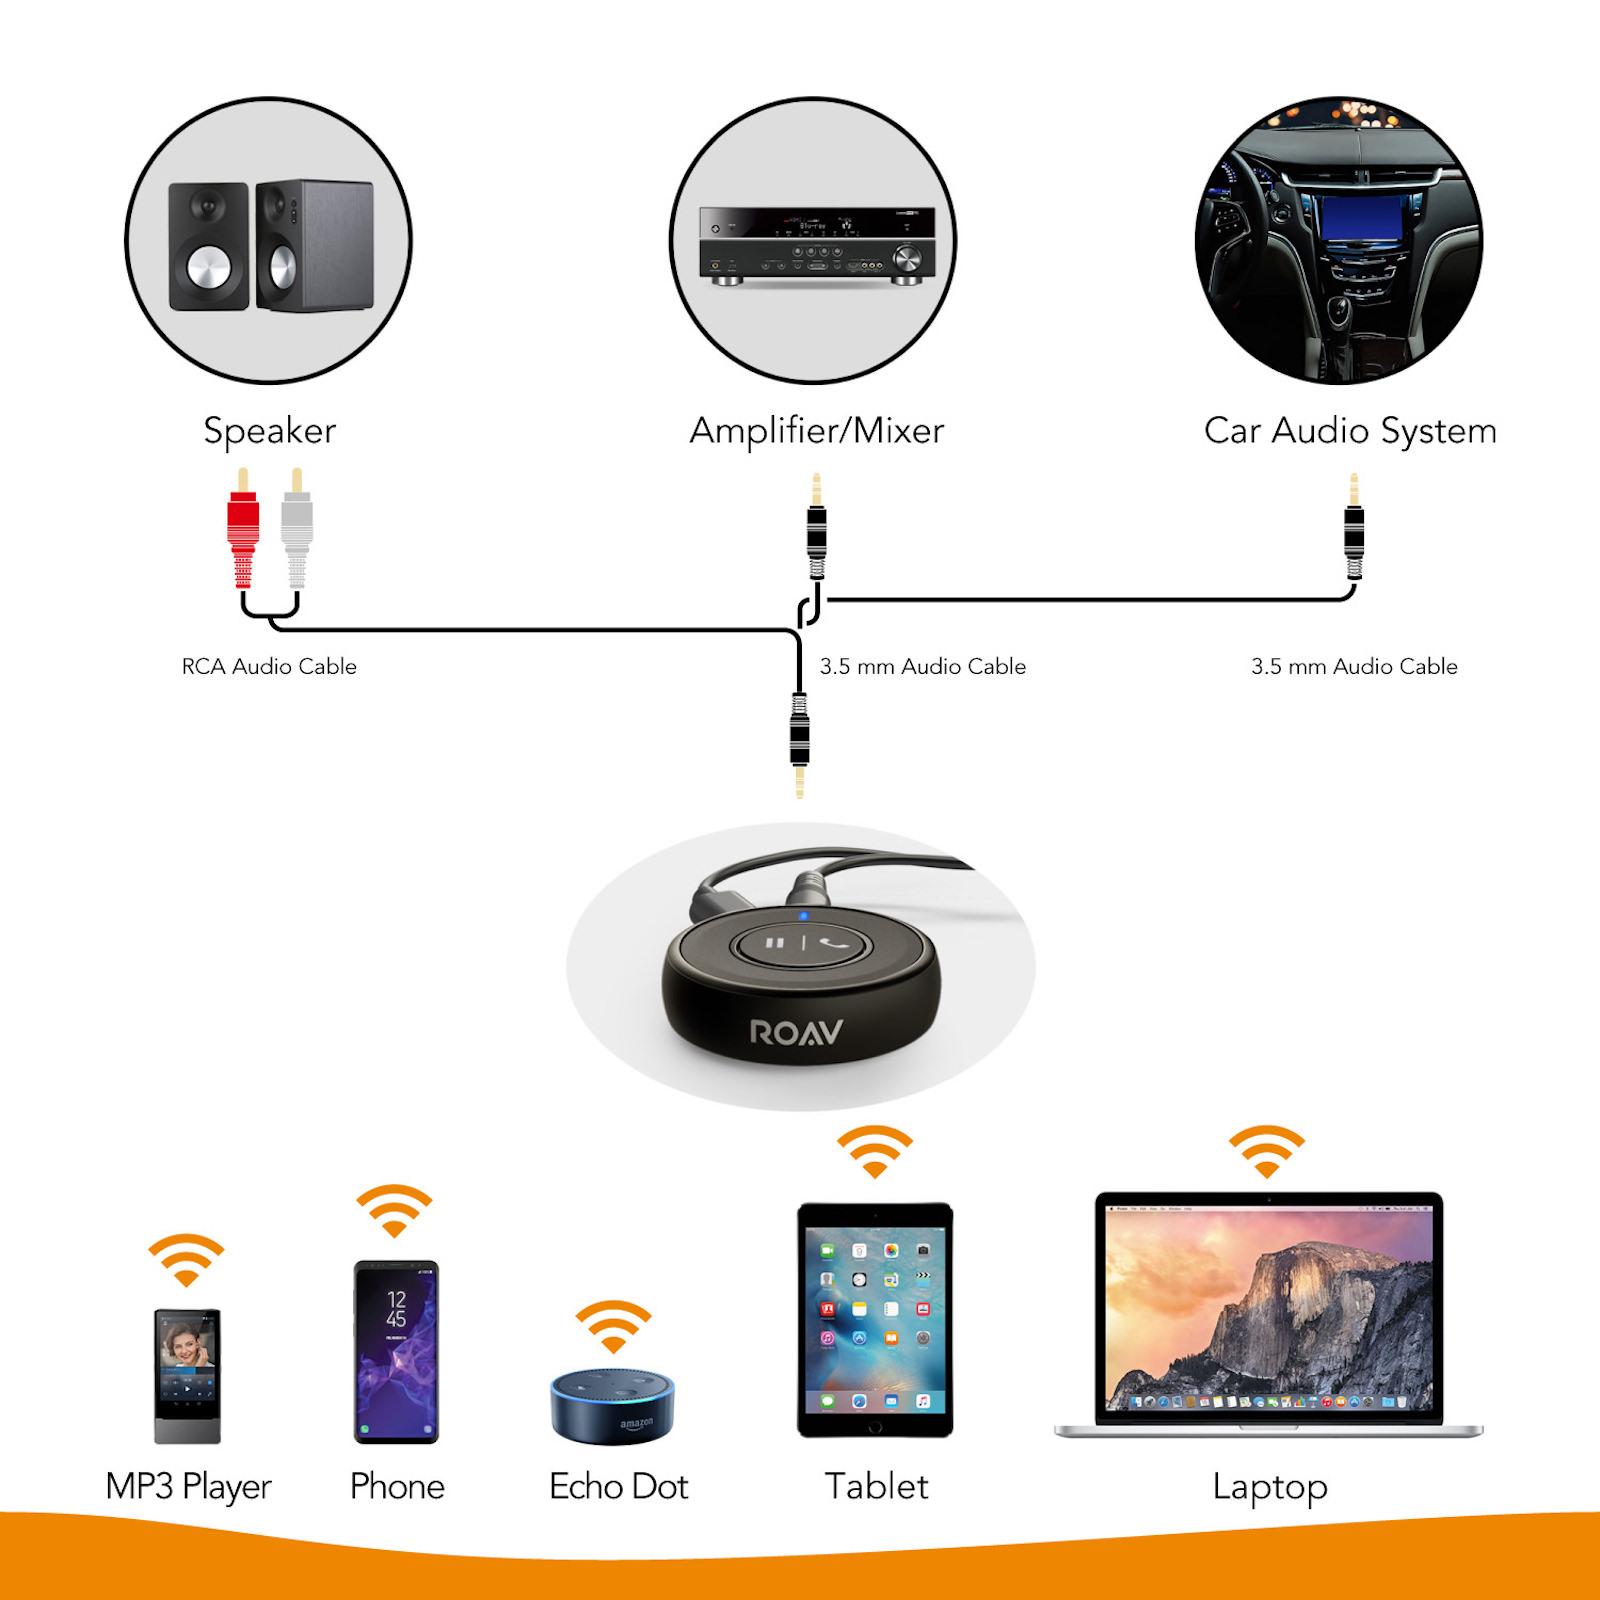 Anker Roav Bluetooth Receiver B2 2